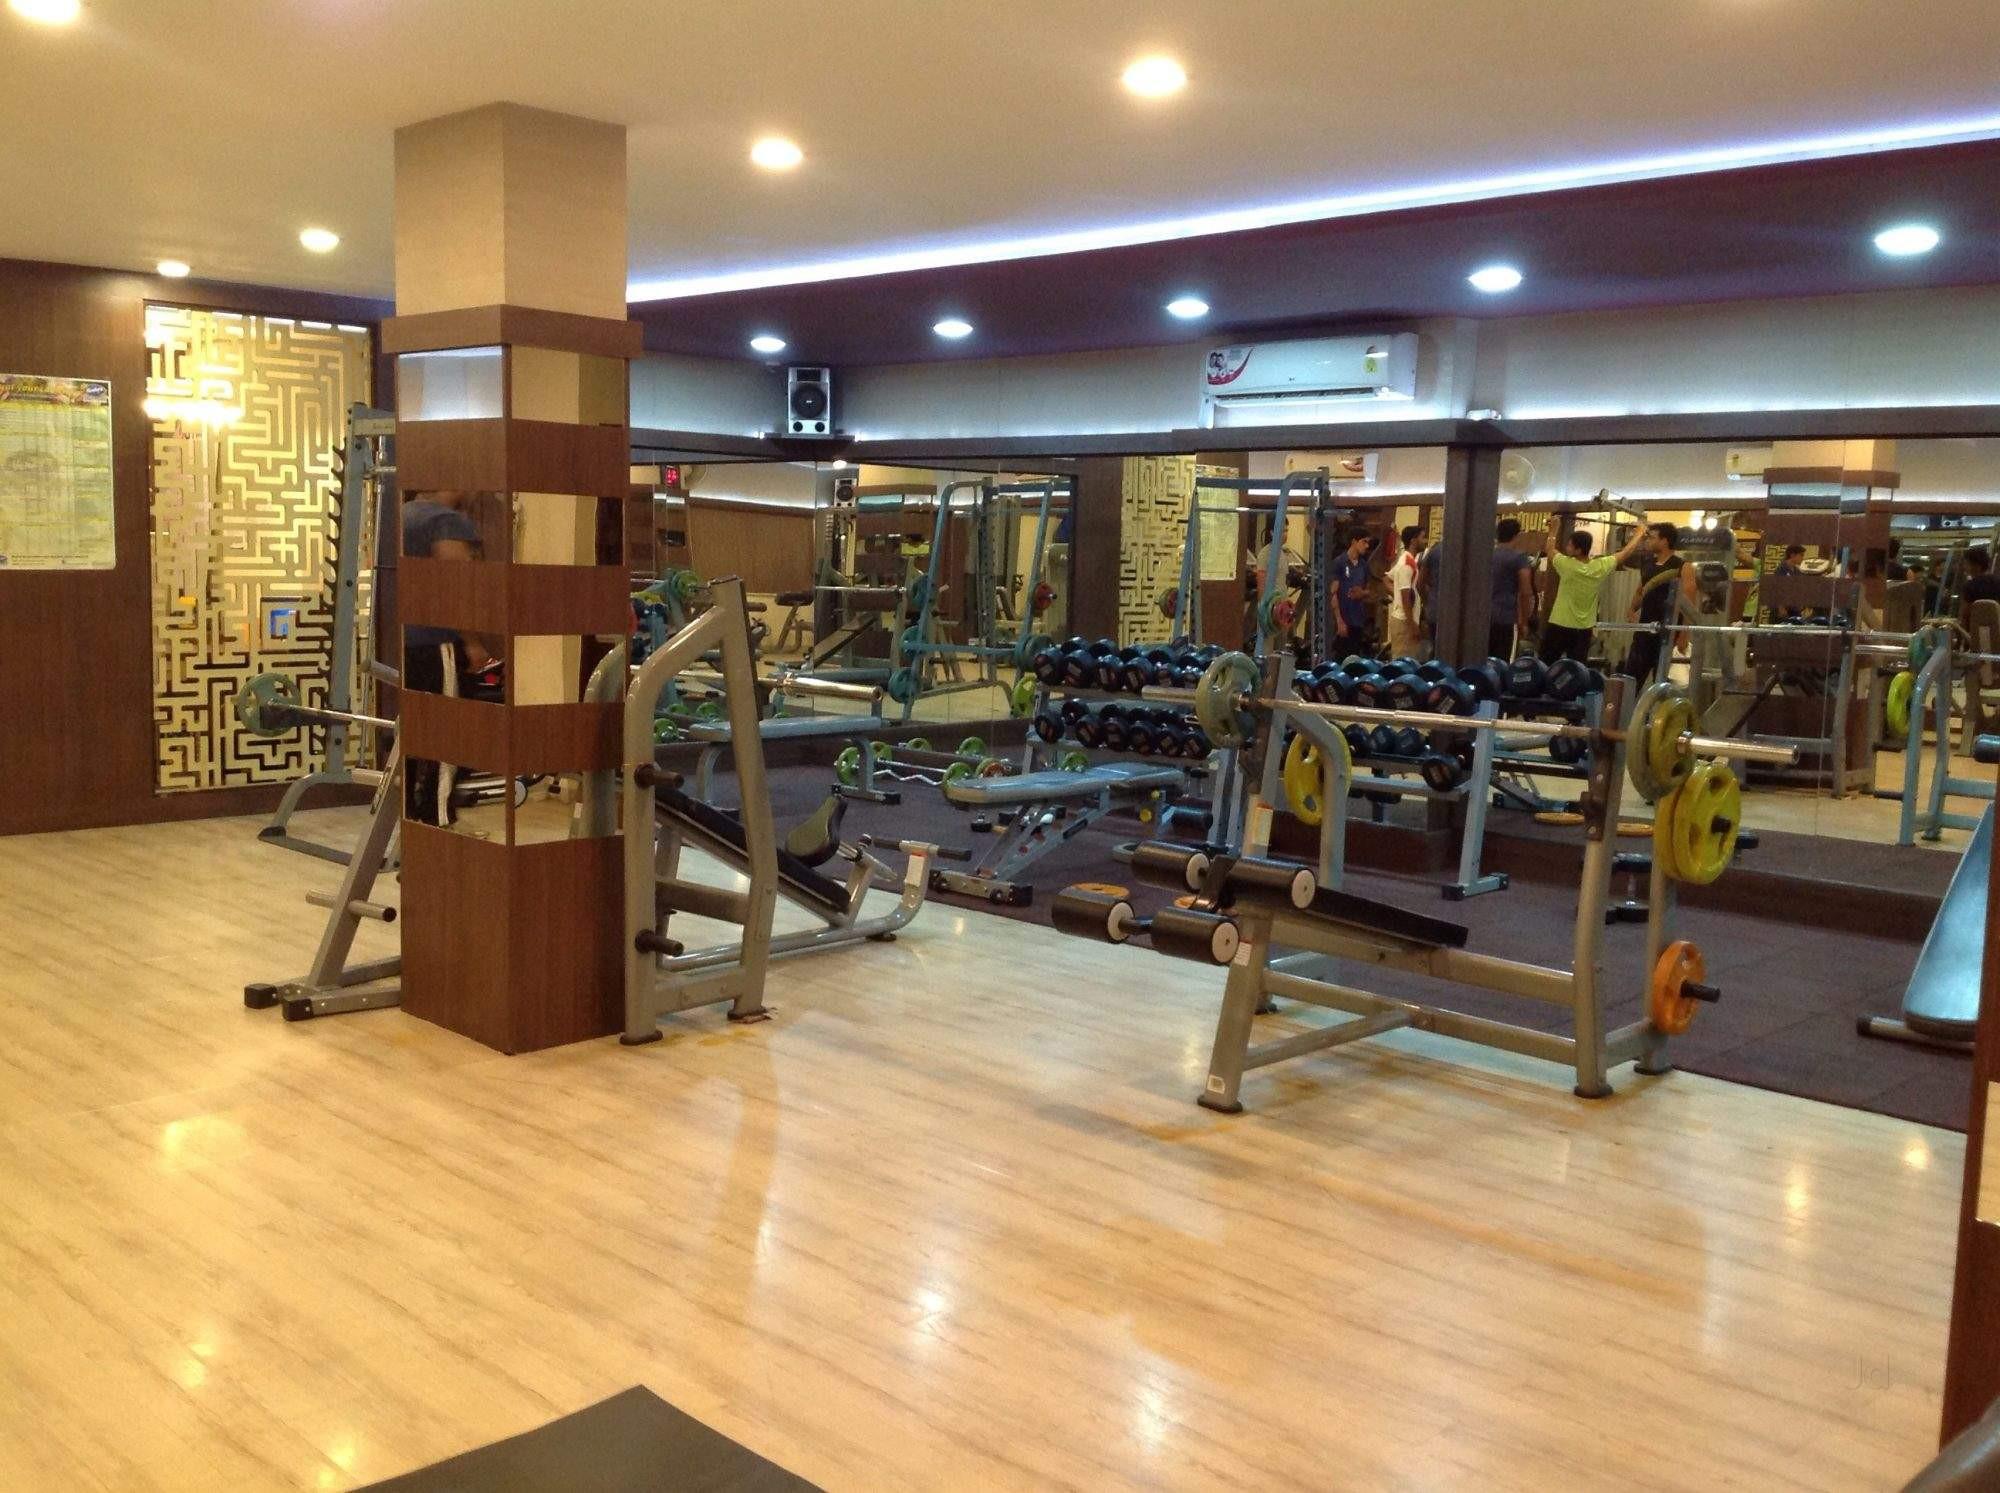 prestige hardwood flooring elmsford ny of d gym vijay nagar gyms in indore justdial regarding d gym vijay nagar indore gyms wiem5d